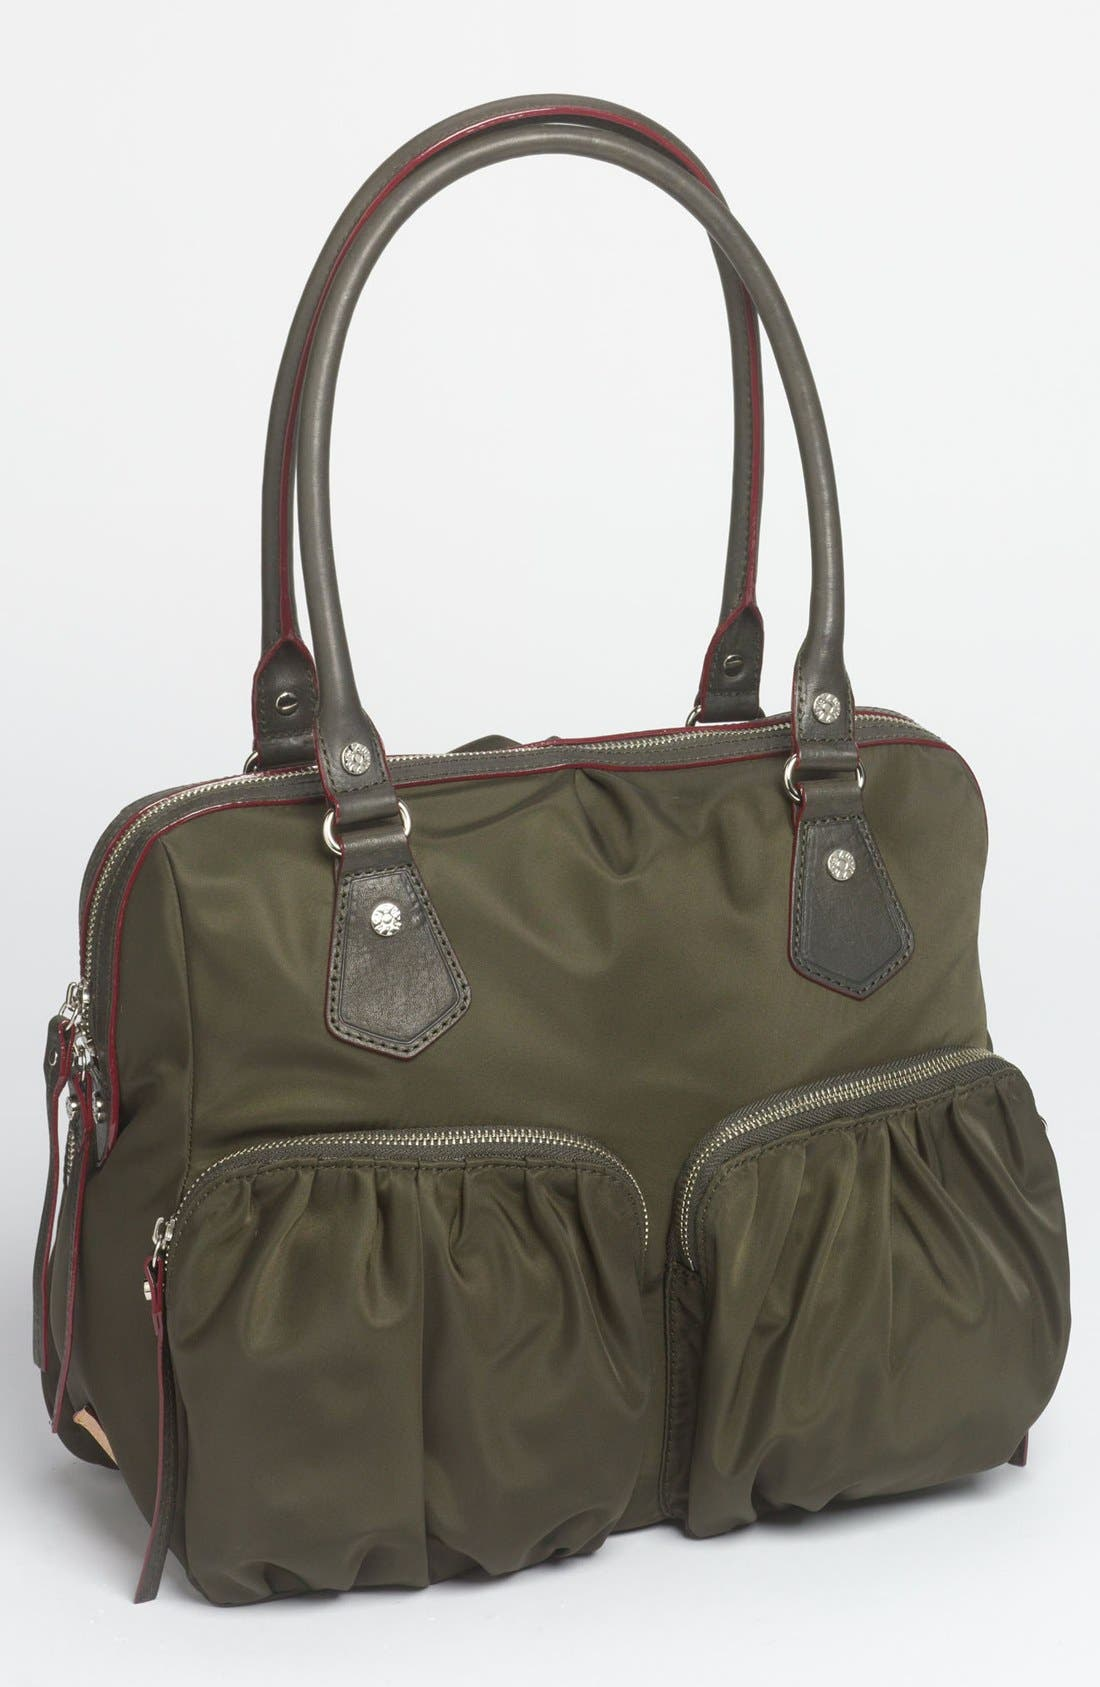 Alternate Image 1 Selected - MZ Wallace 'Jane' Handbag, Medium